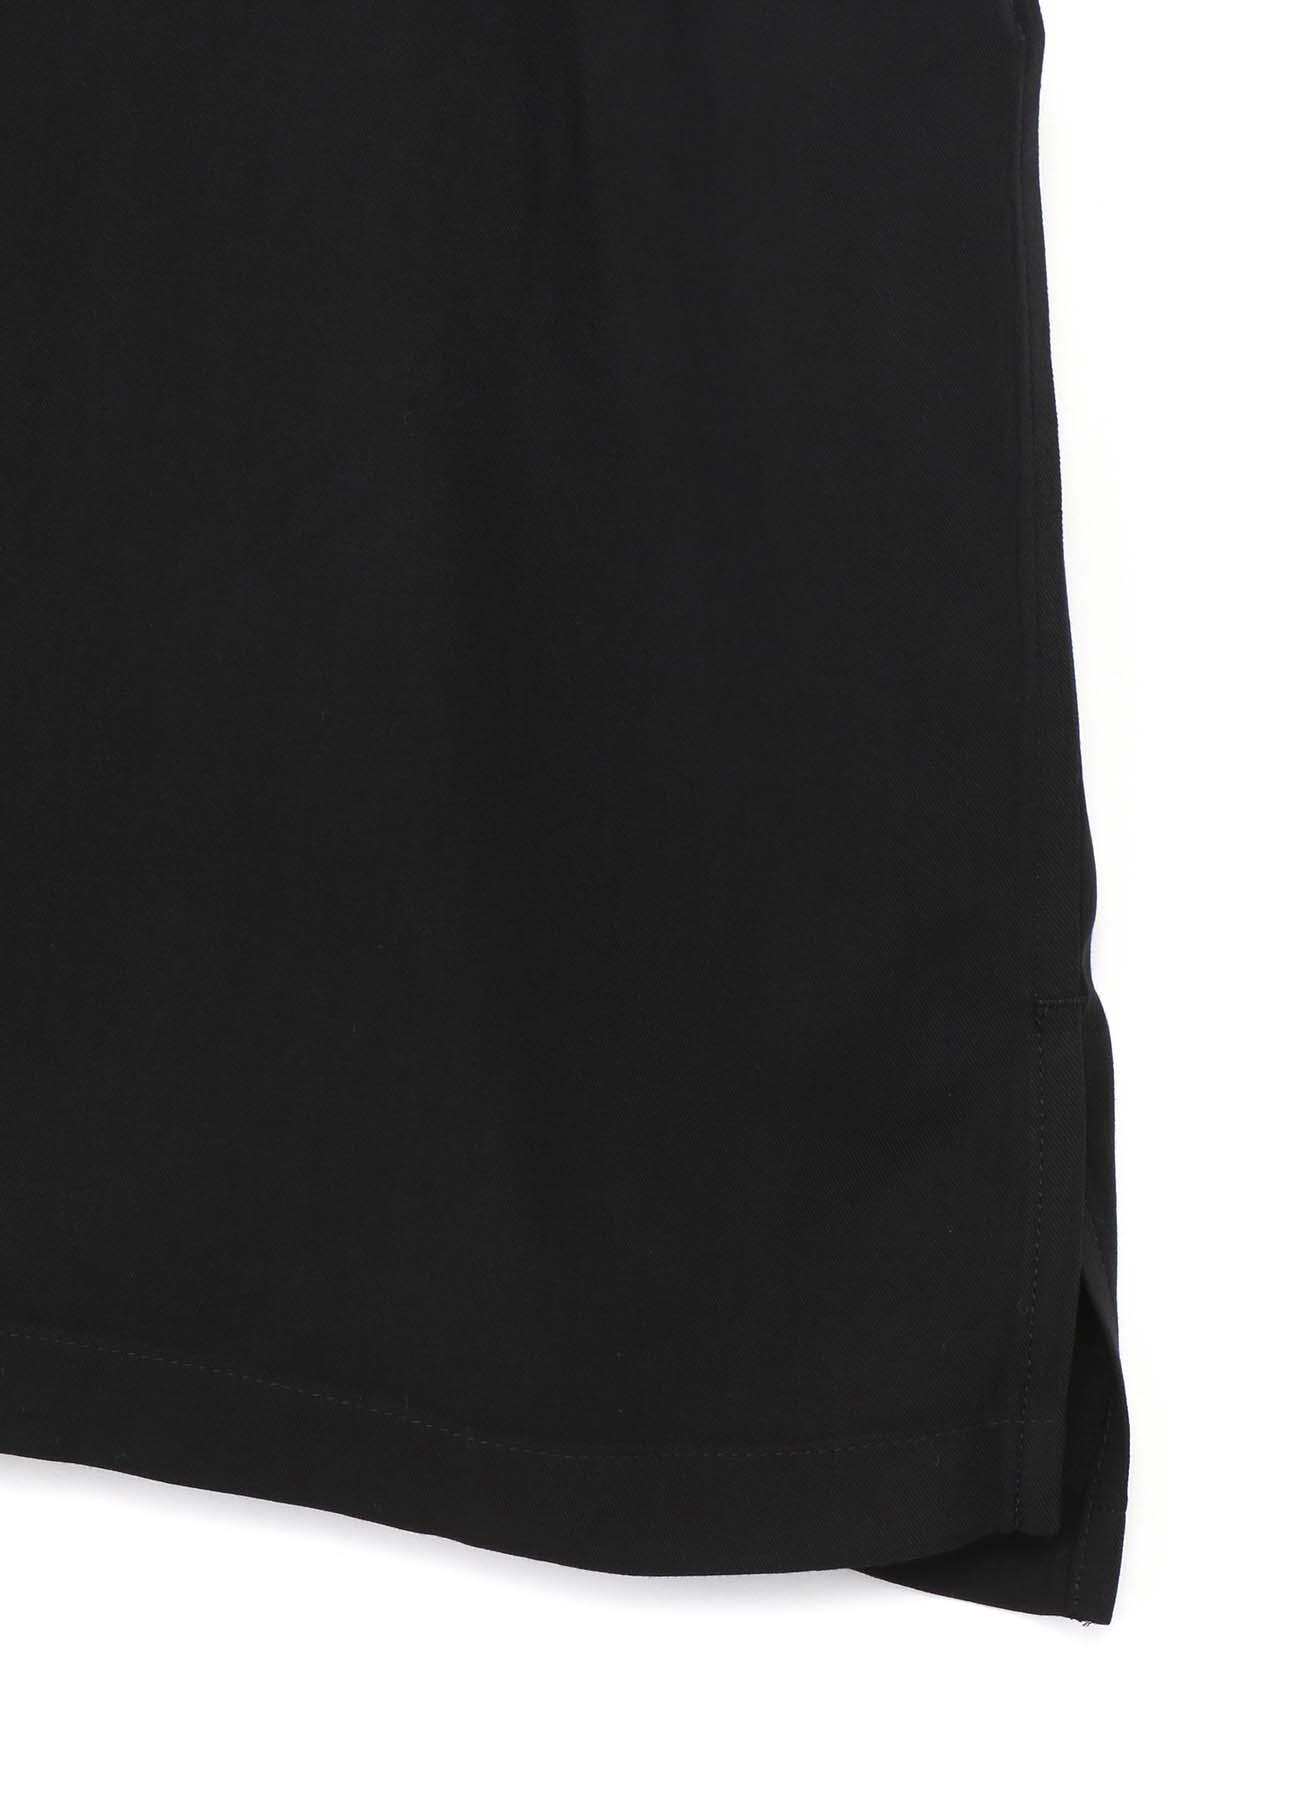 60s Ry/Span Twill Washer Open Collar Short Sleeve Big Shirt